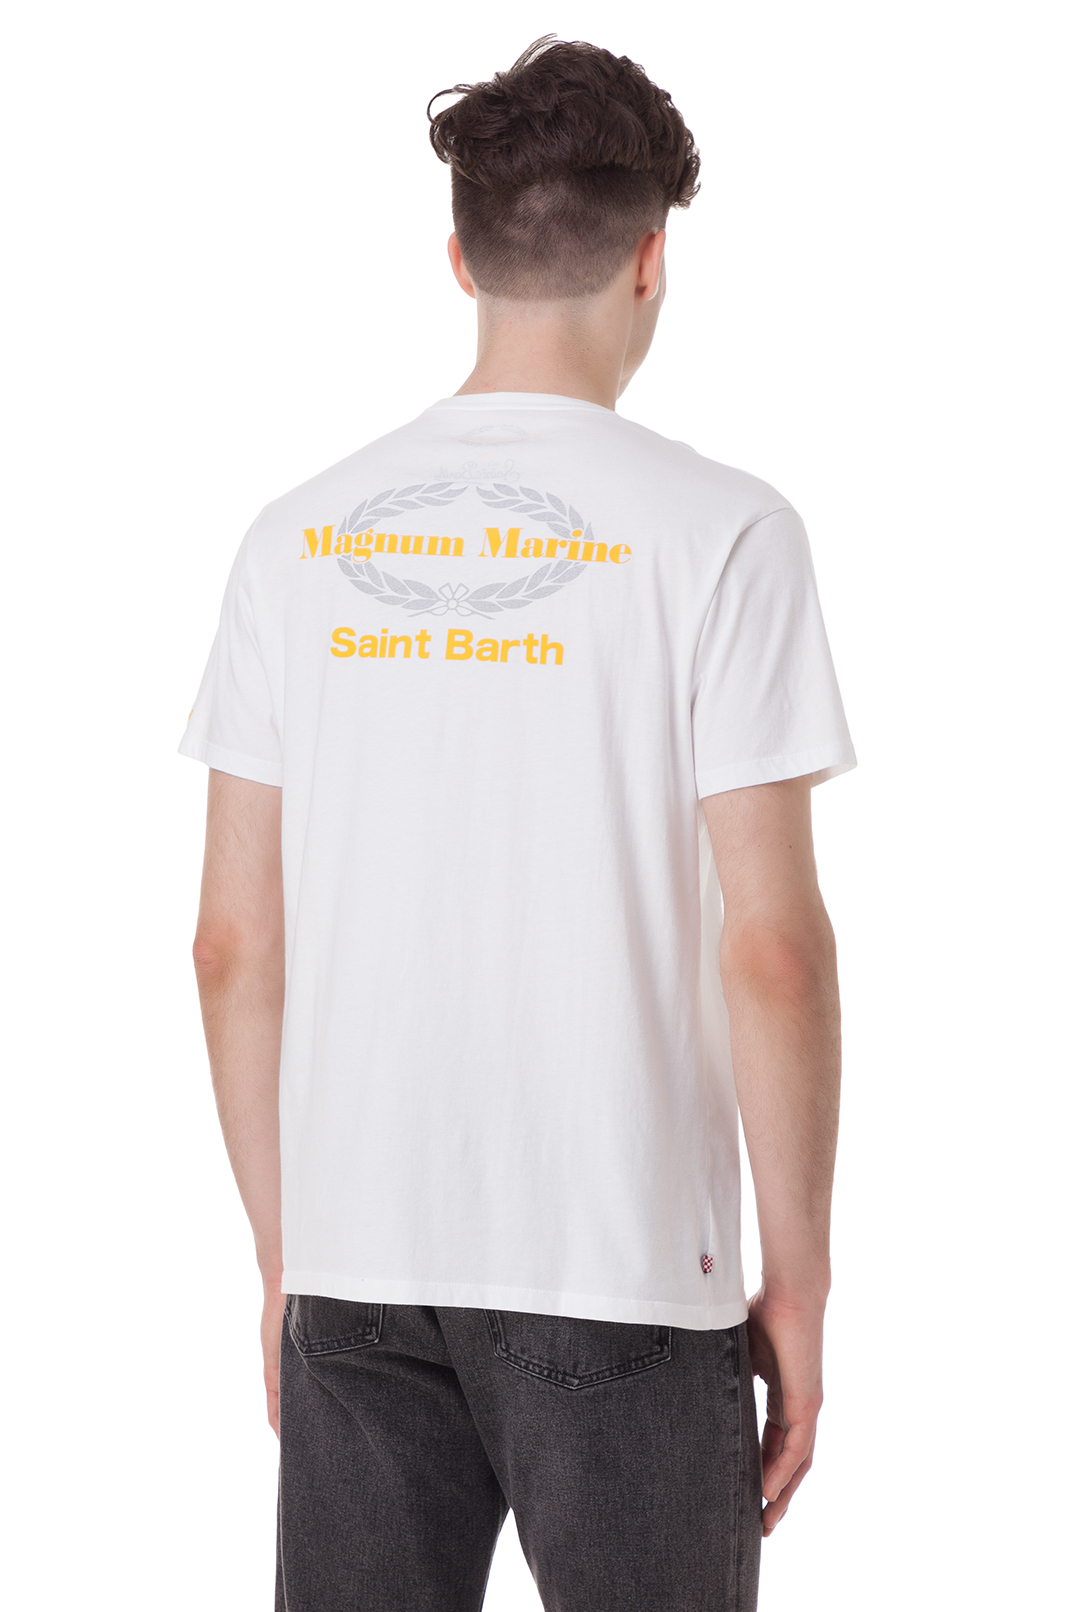 Футболка с логотипом MC2 ST.BARTH STBm18035